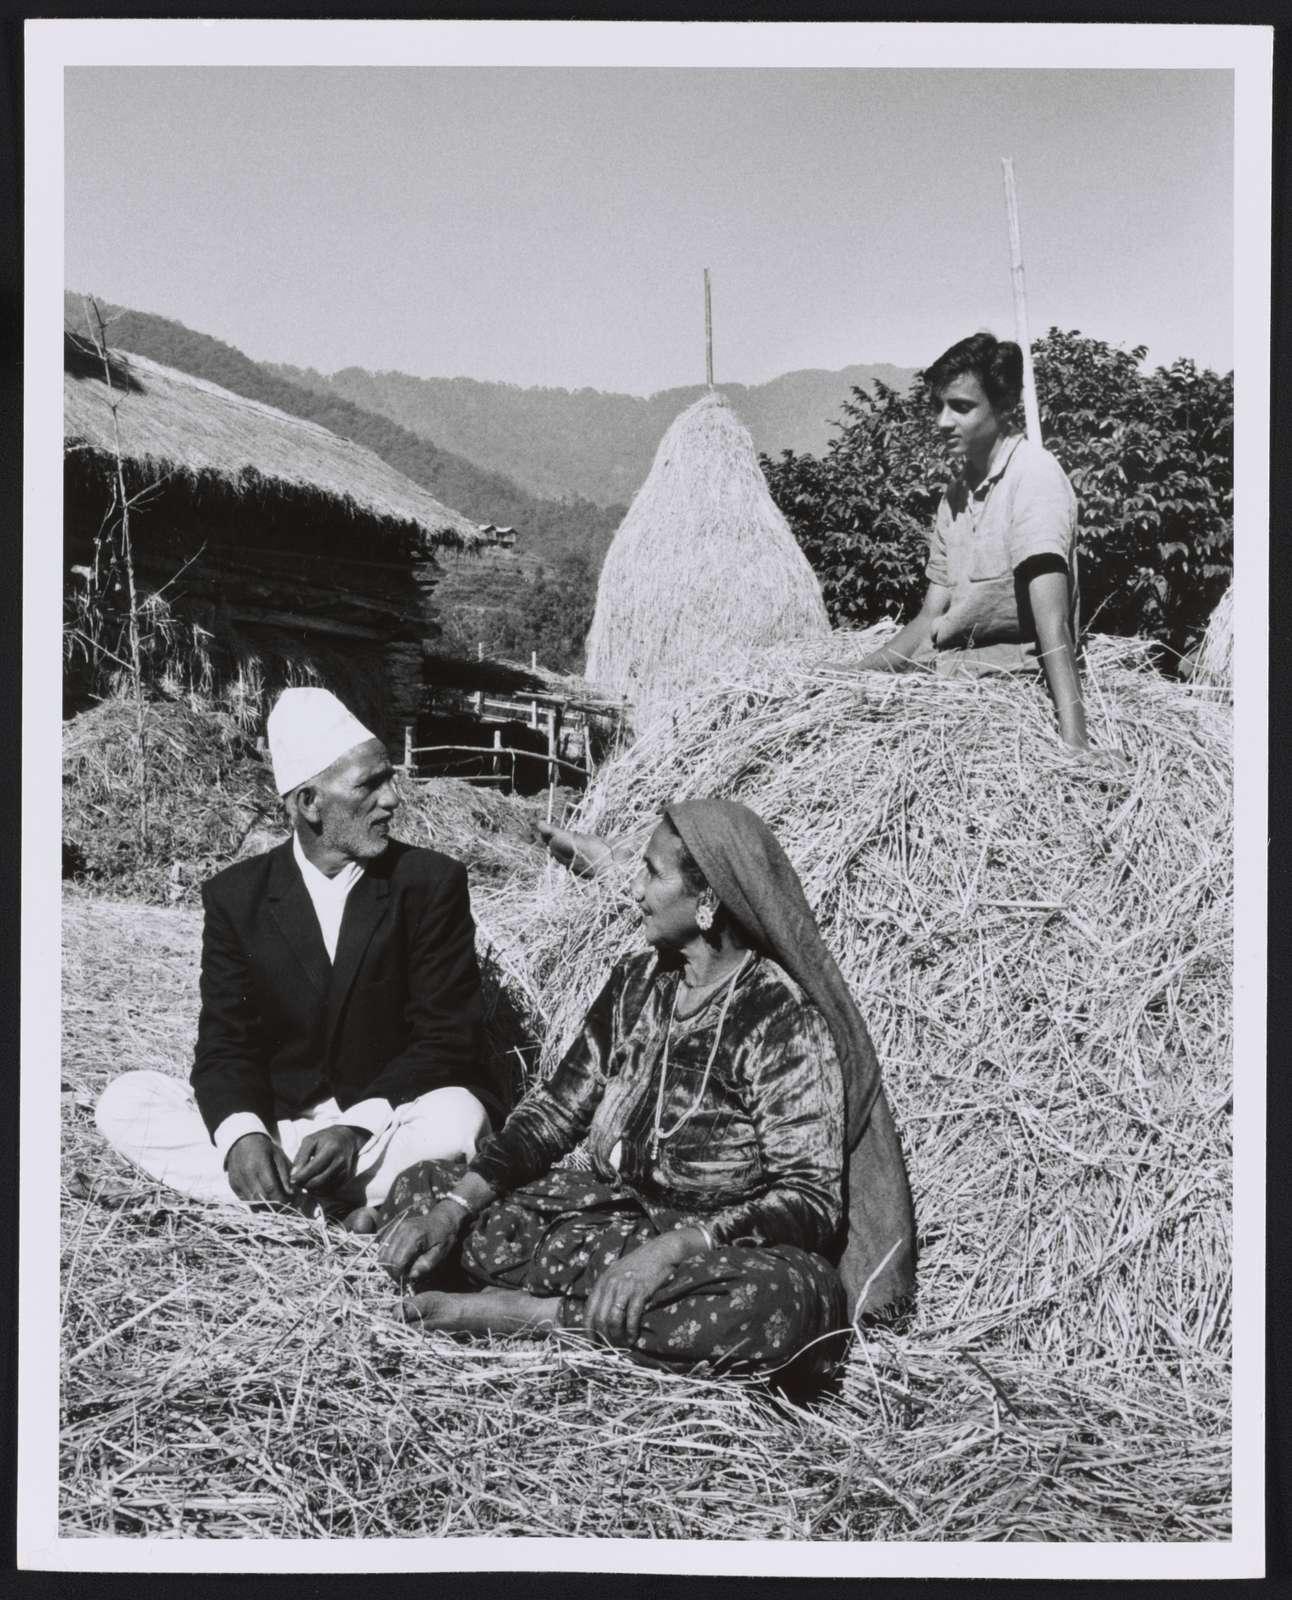 [Nepalese family sitting outside on haystacks, Sikkim]